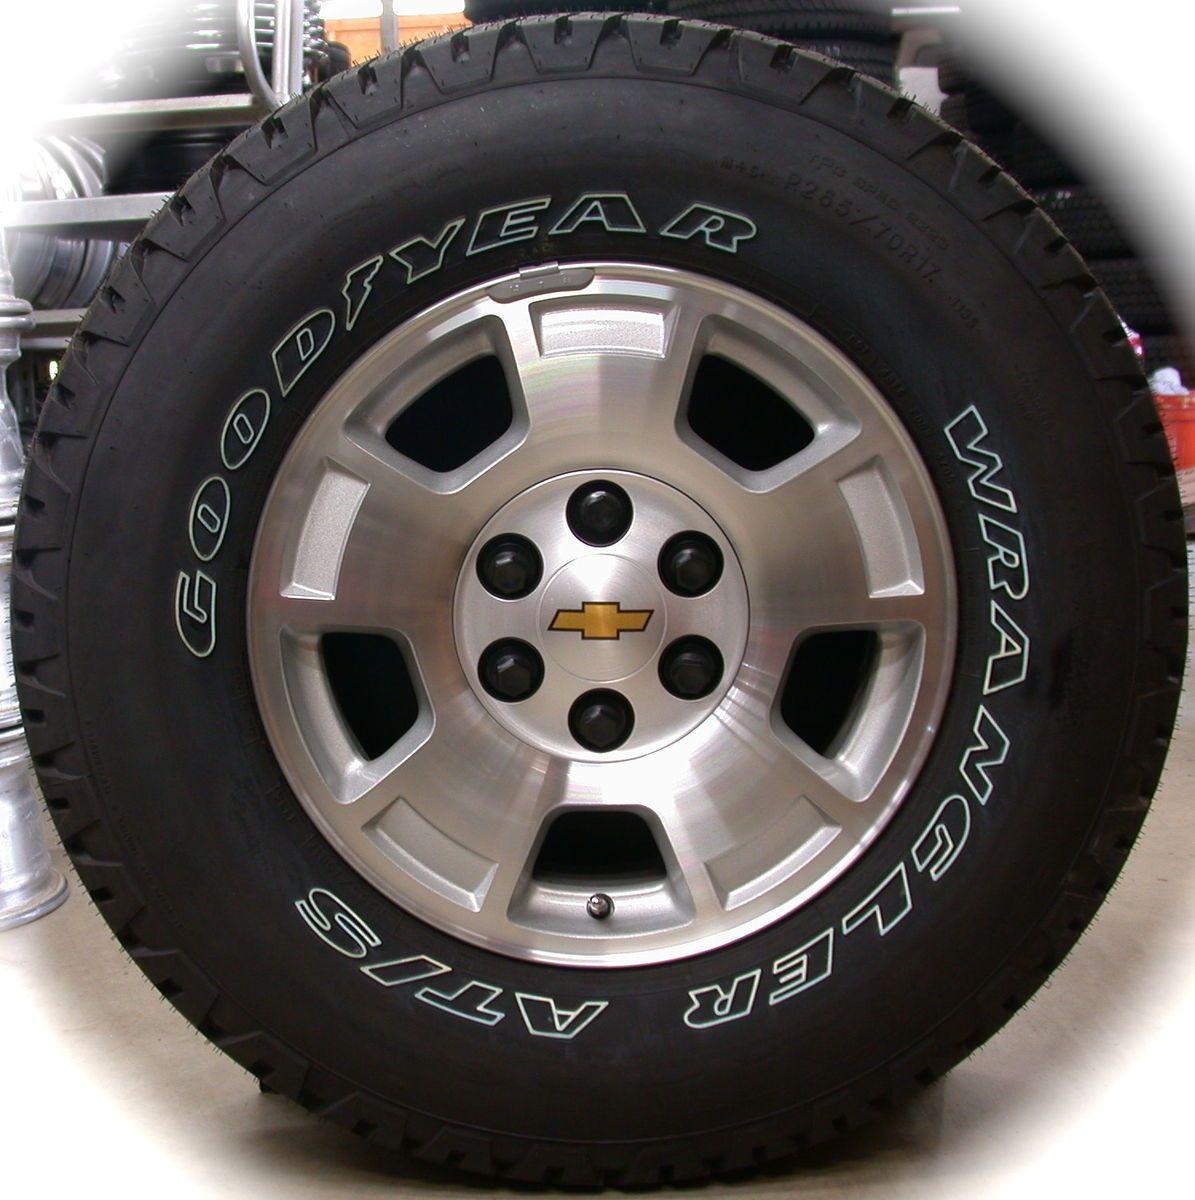 Silverado Tahoe Suburban Avalanche OEM Factory 17 Wheels Rims Tires